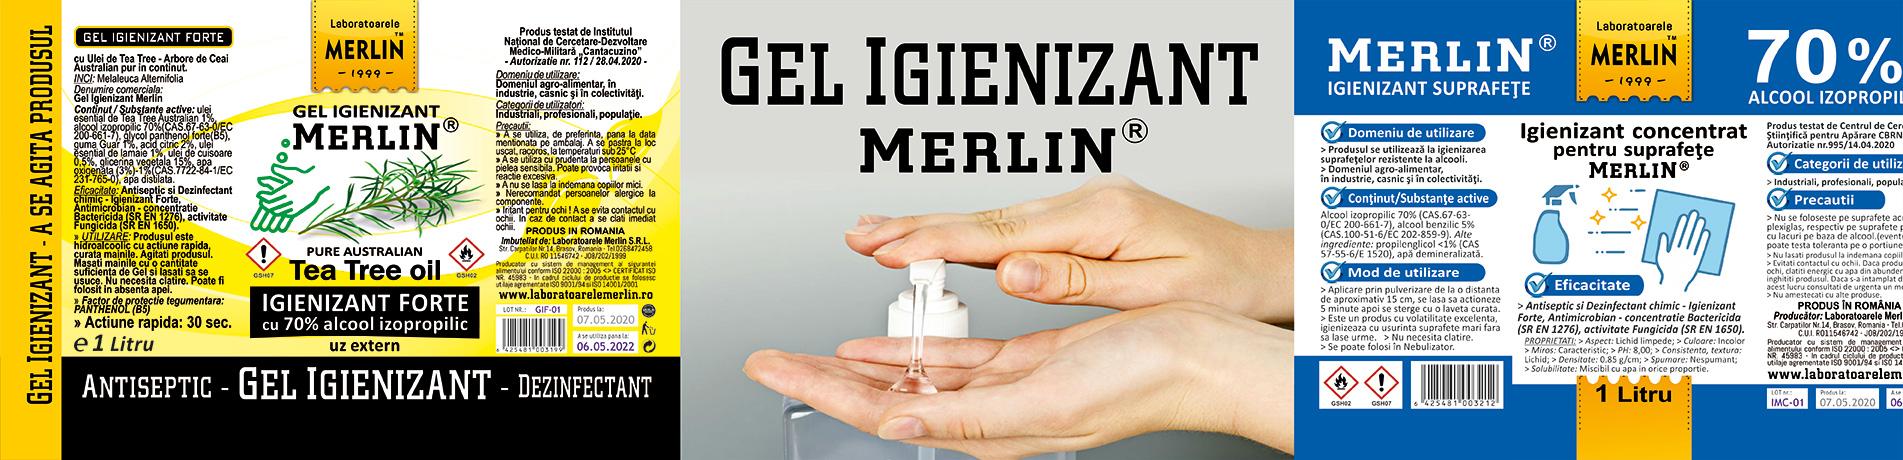 banner-GEL-IGIENIZANT-MAINI+IGIENIZANT-SUPRAFETE-70-alcool-Merlin